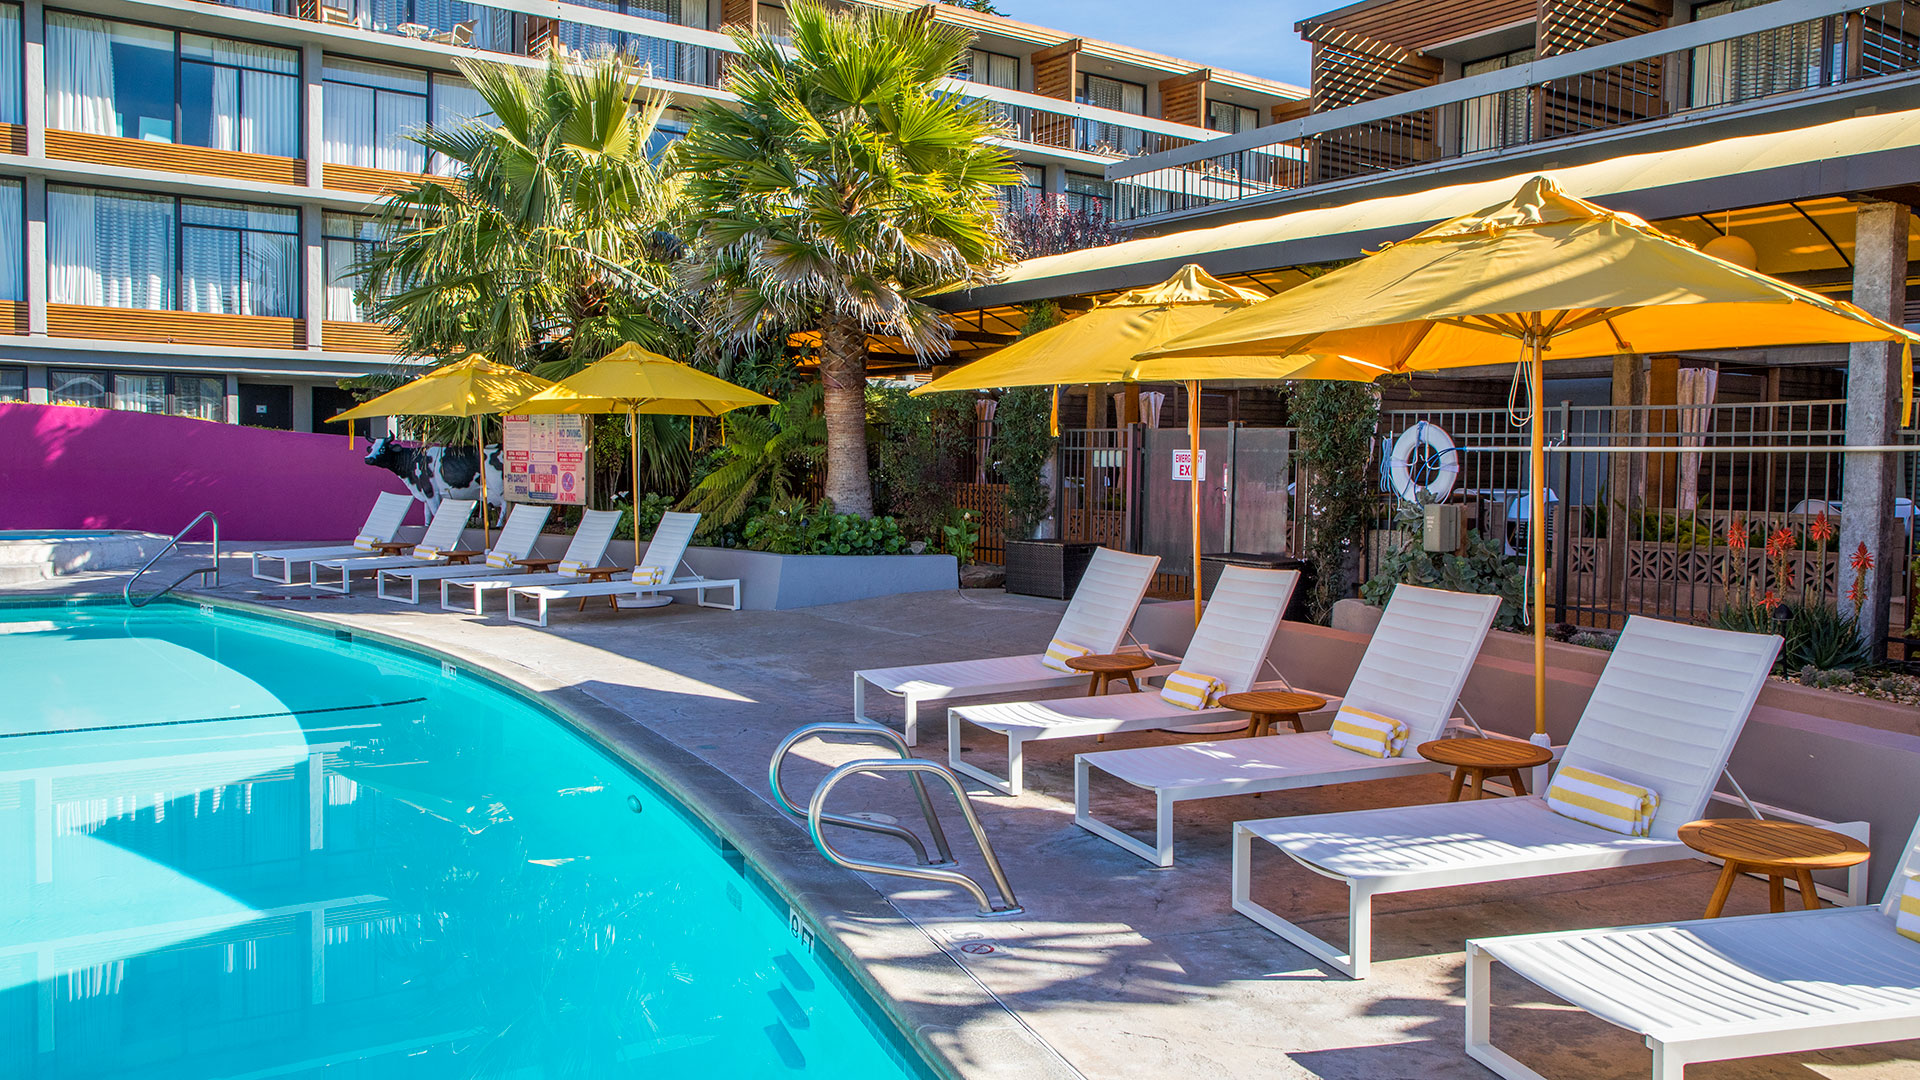 Carmel Mission Inn Outdoor Pool Area